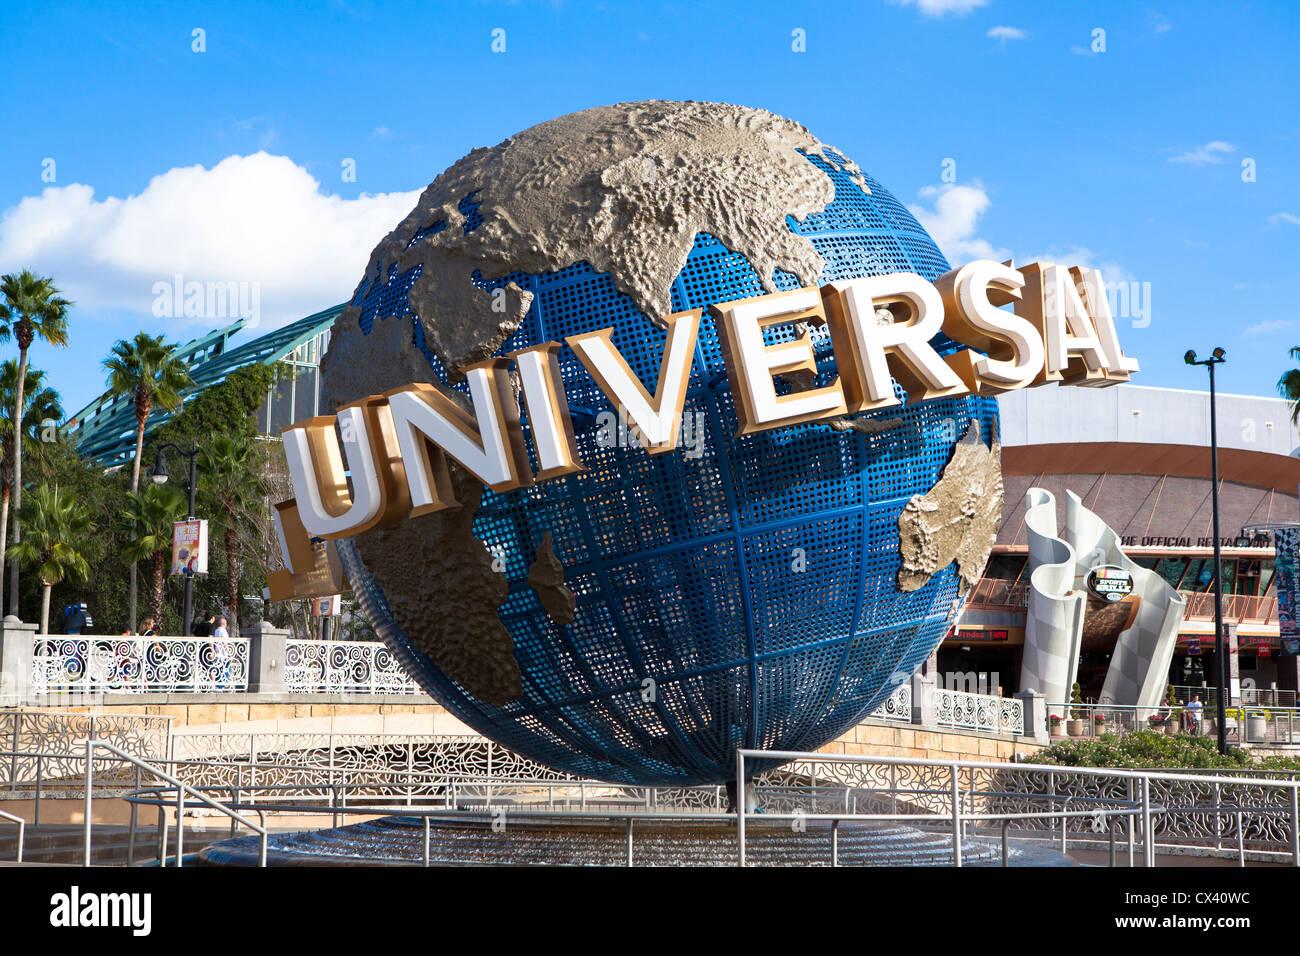 Universal studios theme park orlando florida usa stock for A new image salon orlando